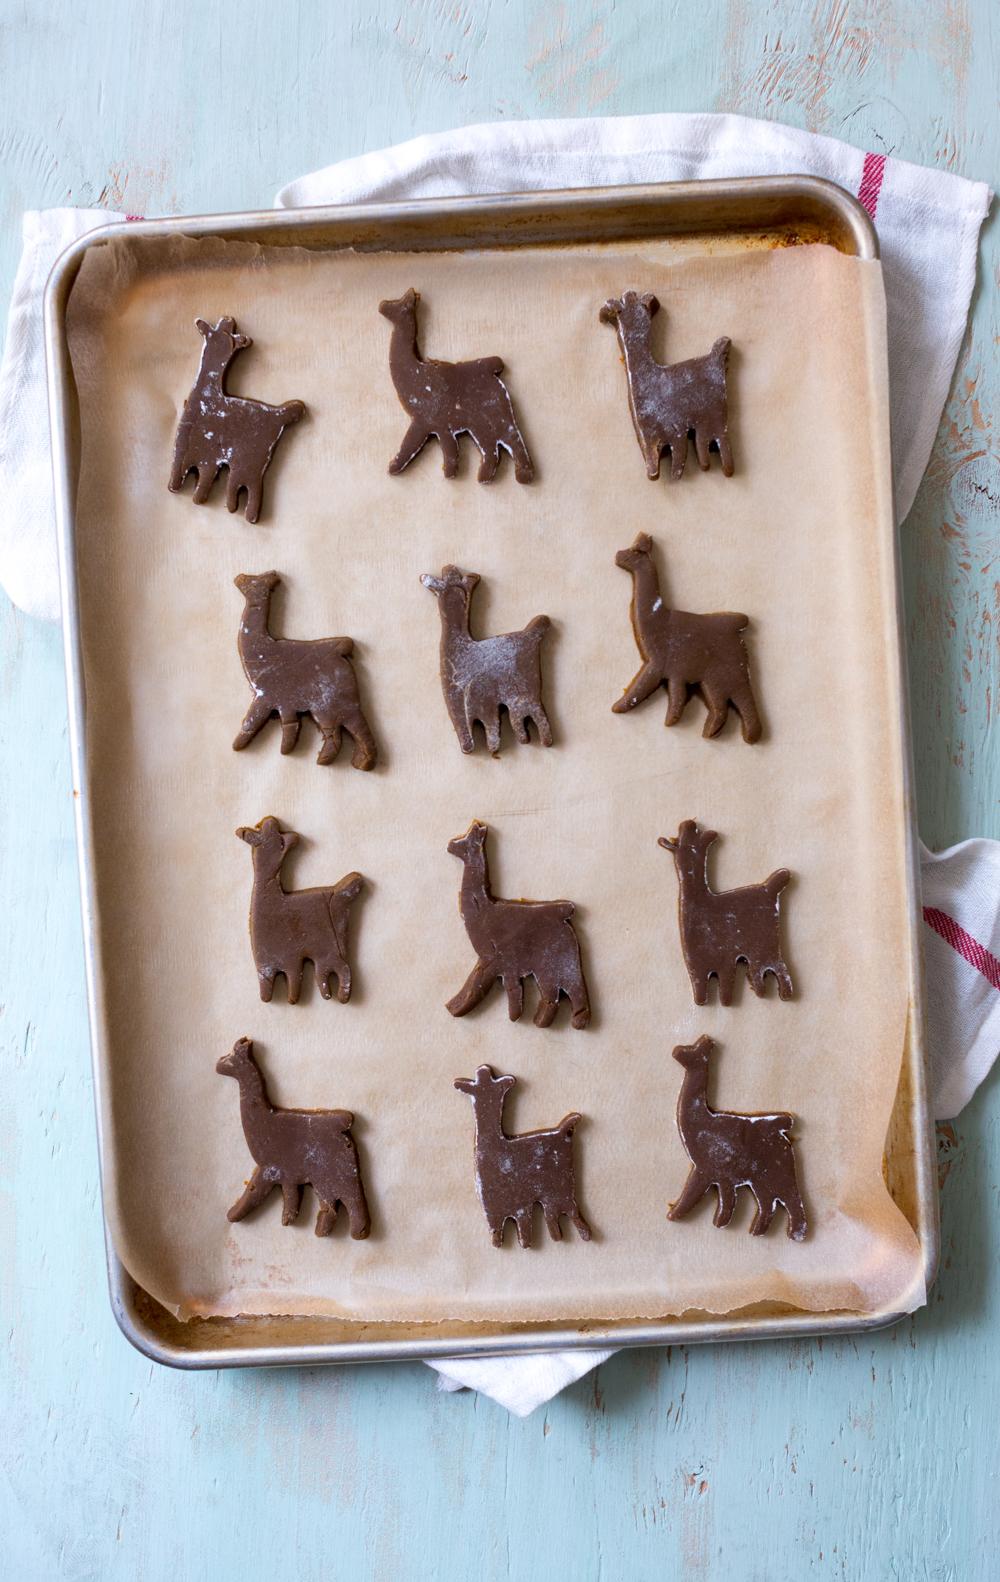 Gingerbread Coconut Llama Cookies - pre-bake